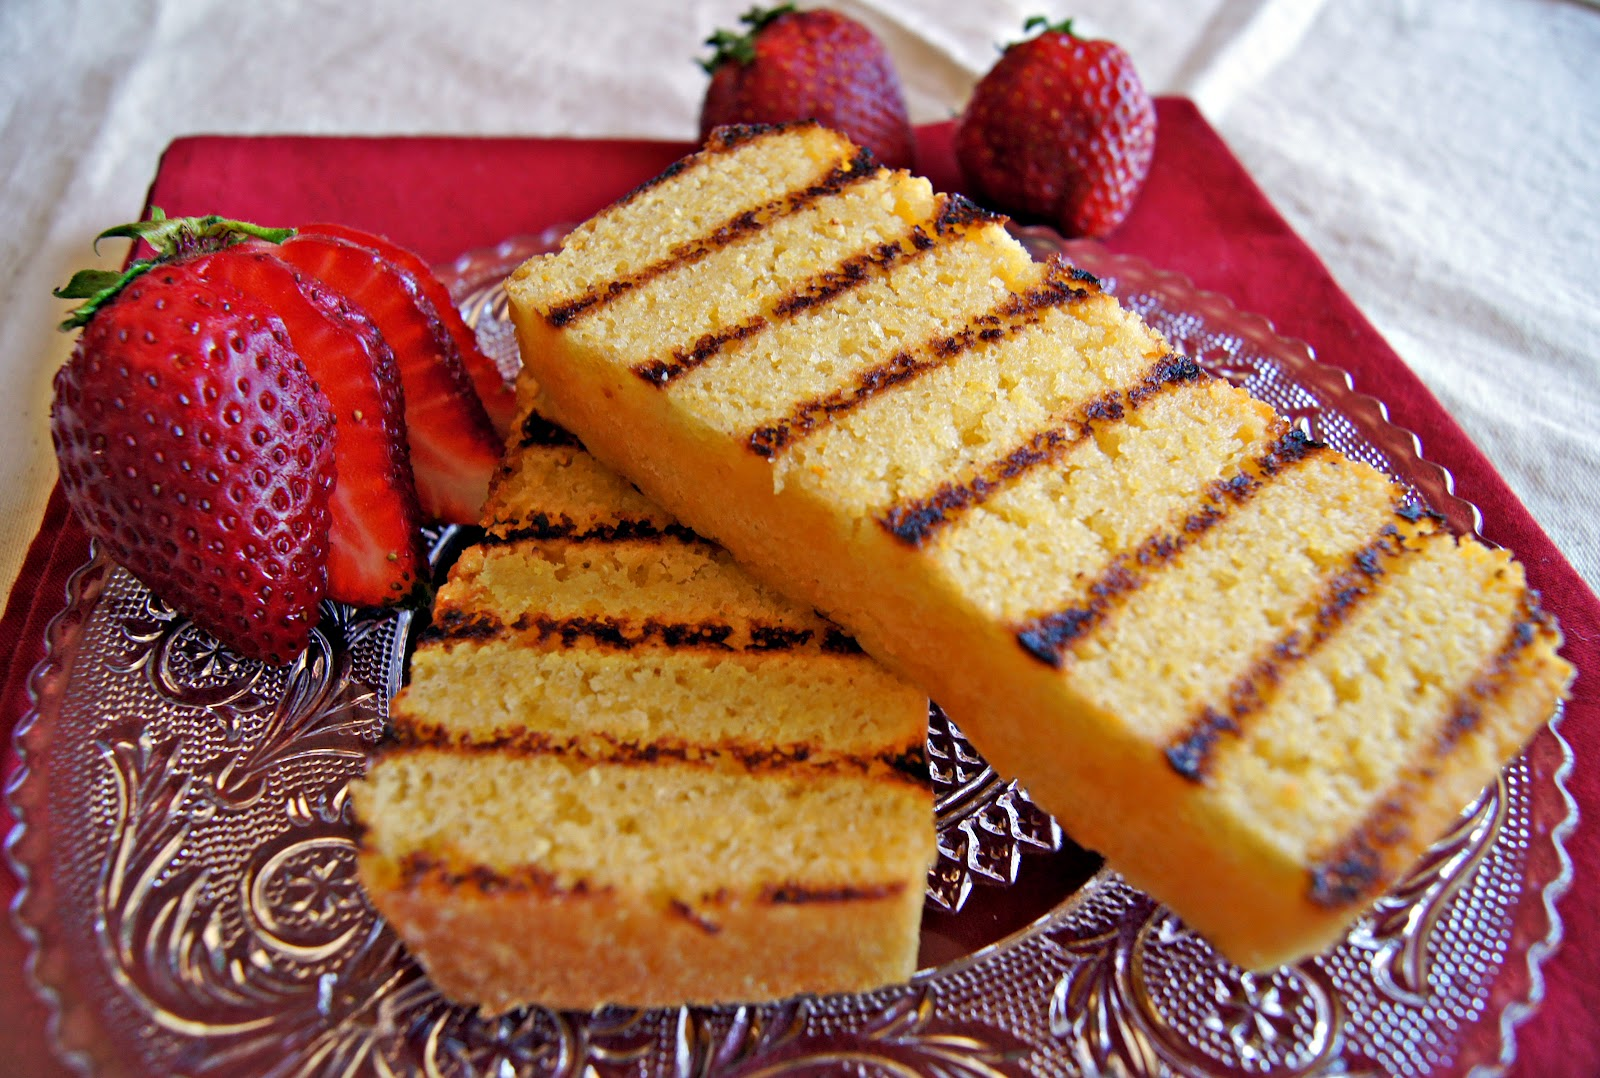 ... pound cake perfect pound cake easy pound cake cream filled grilled